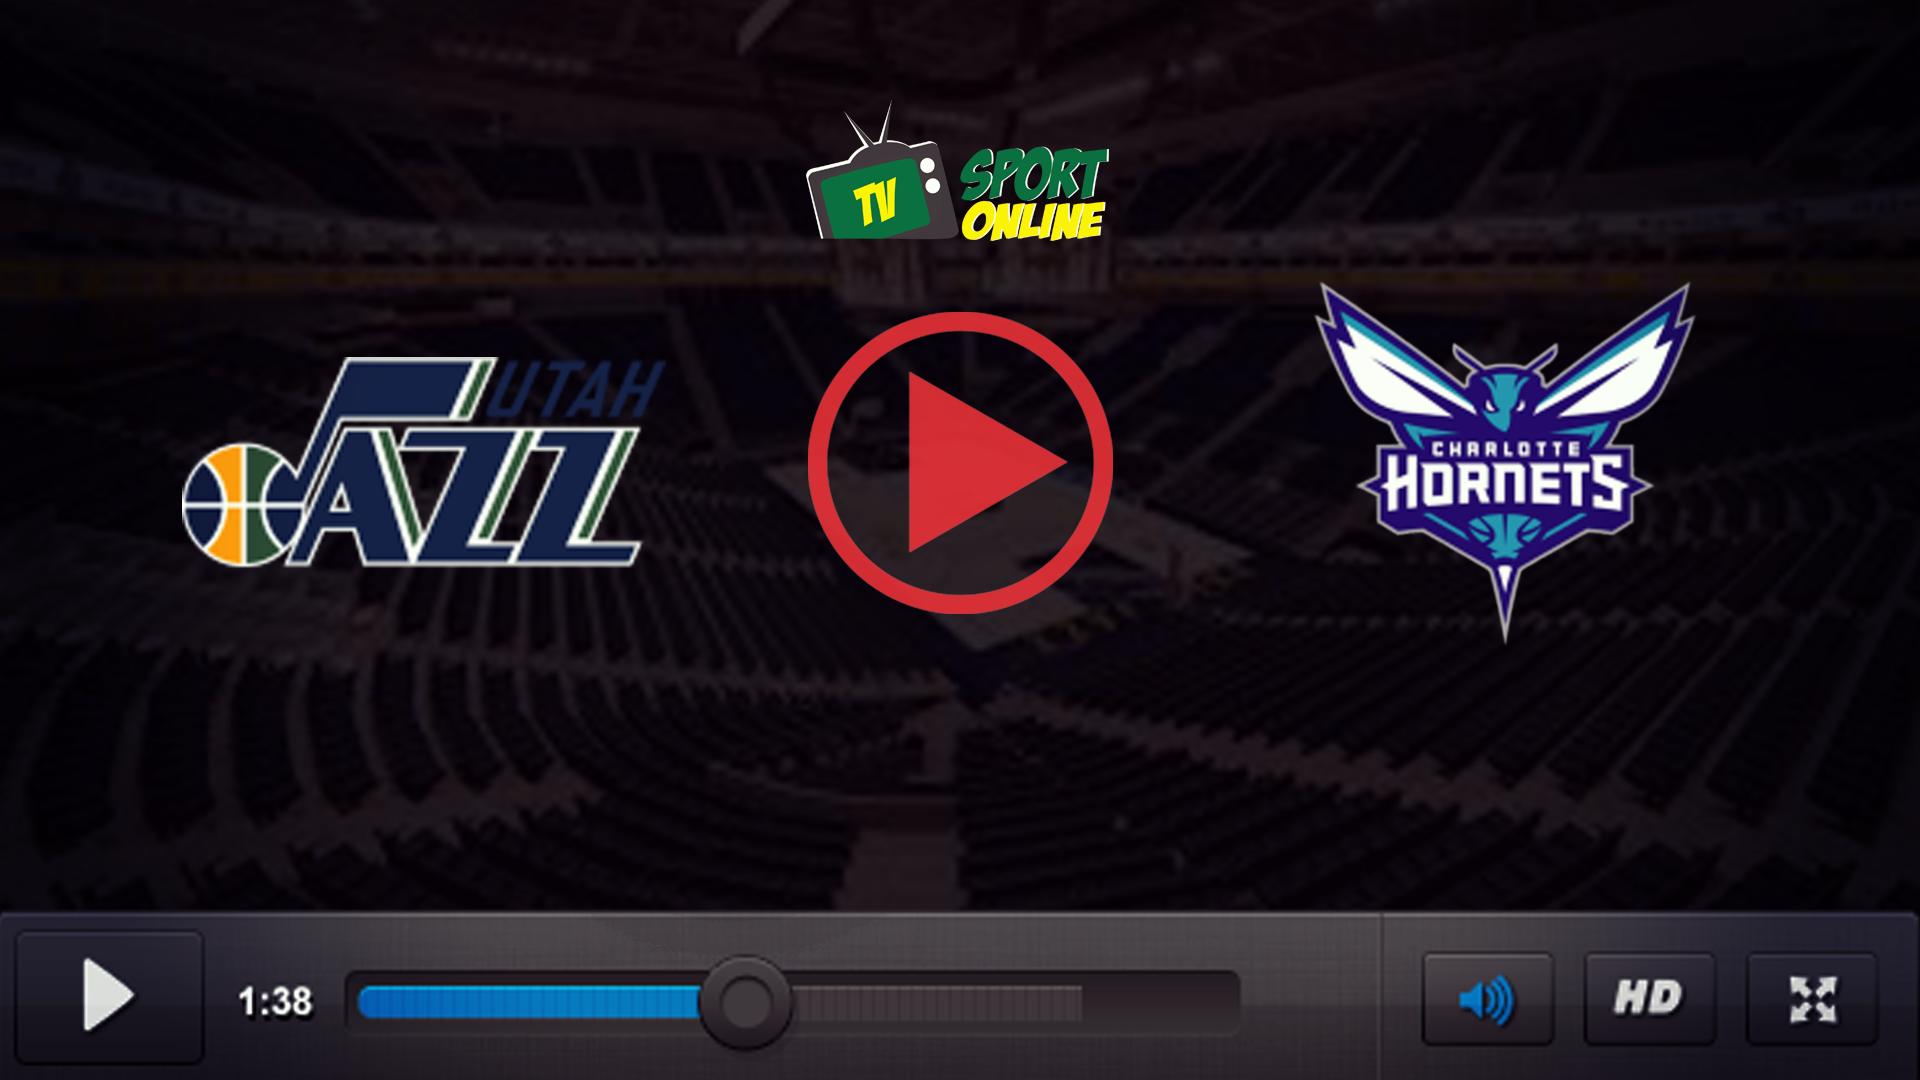 Watch Live Stream Utah Jazz – Charlotte Hornets